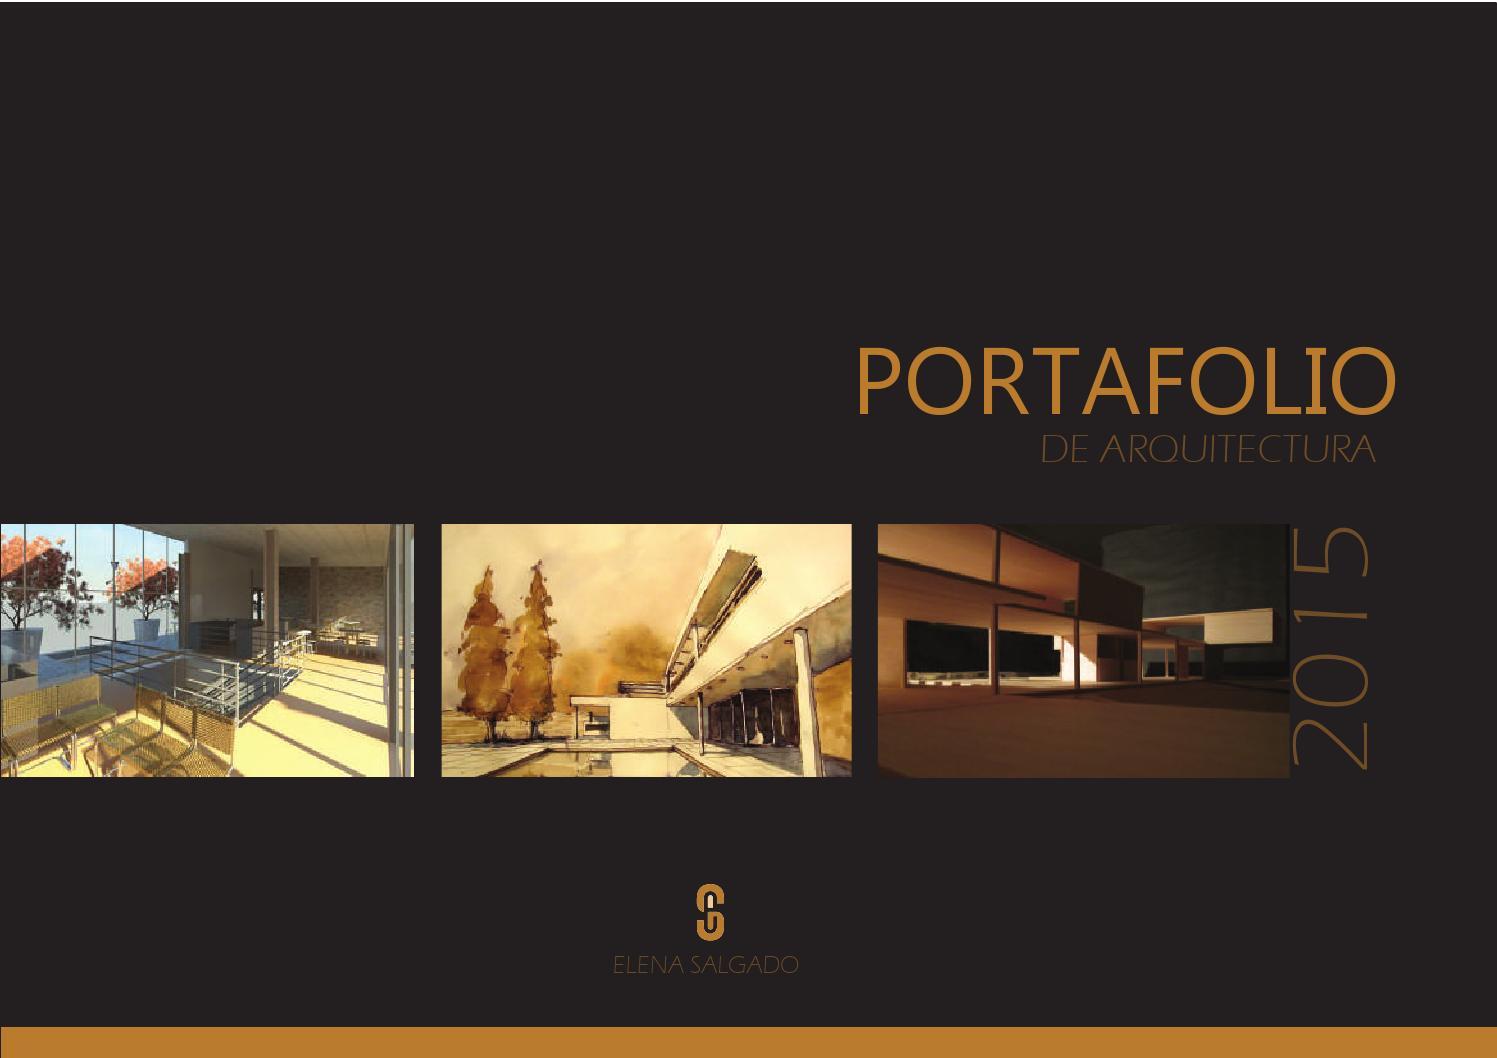 Portafolio de arquitectura by elena salgado issuu for Portafolio arquitectura